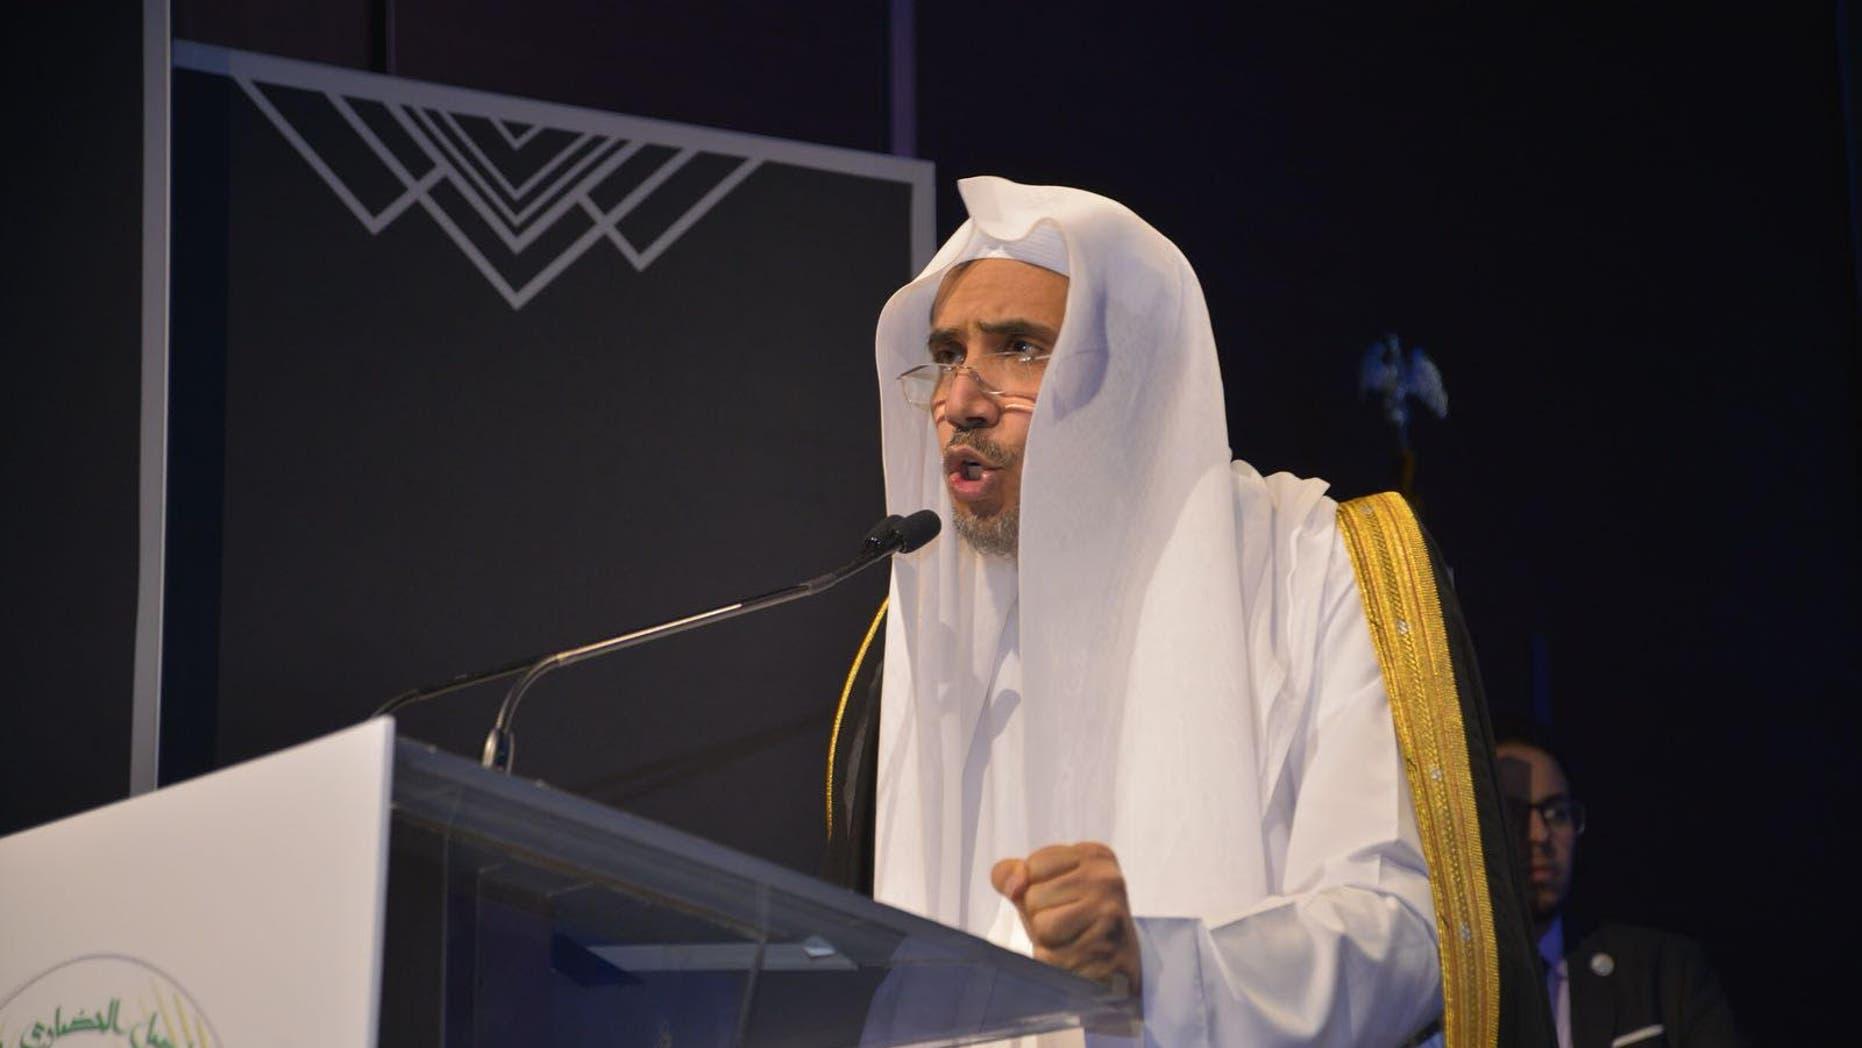 Muhammad bin Abdul Karim Alissa, 43, the former Saudi Justice Minister and current Secretary-General of the Muslim World League